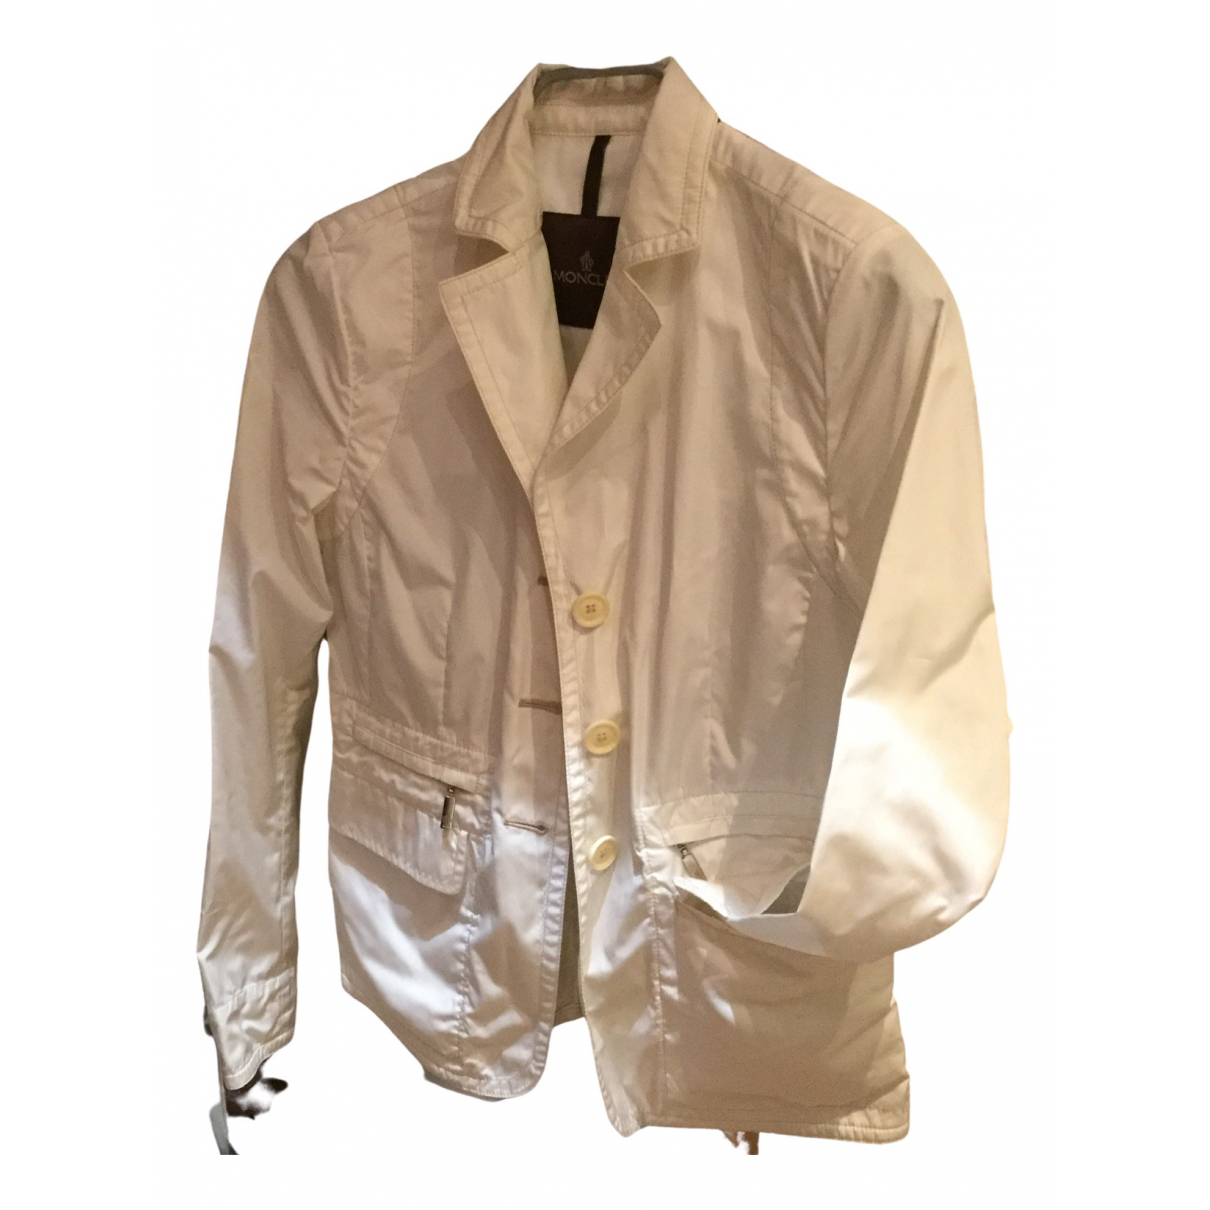 Moncler \N White jacket for Women 0 0-5